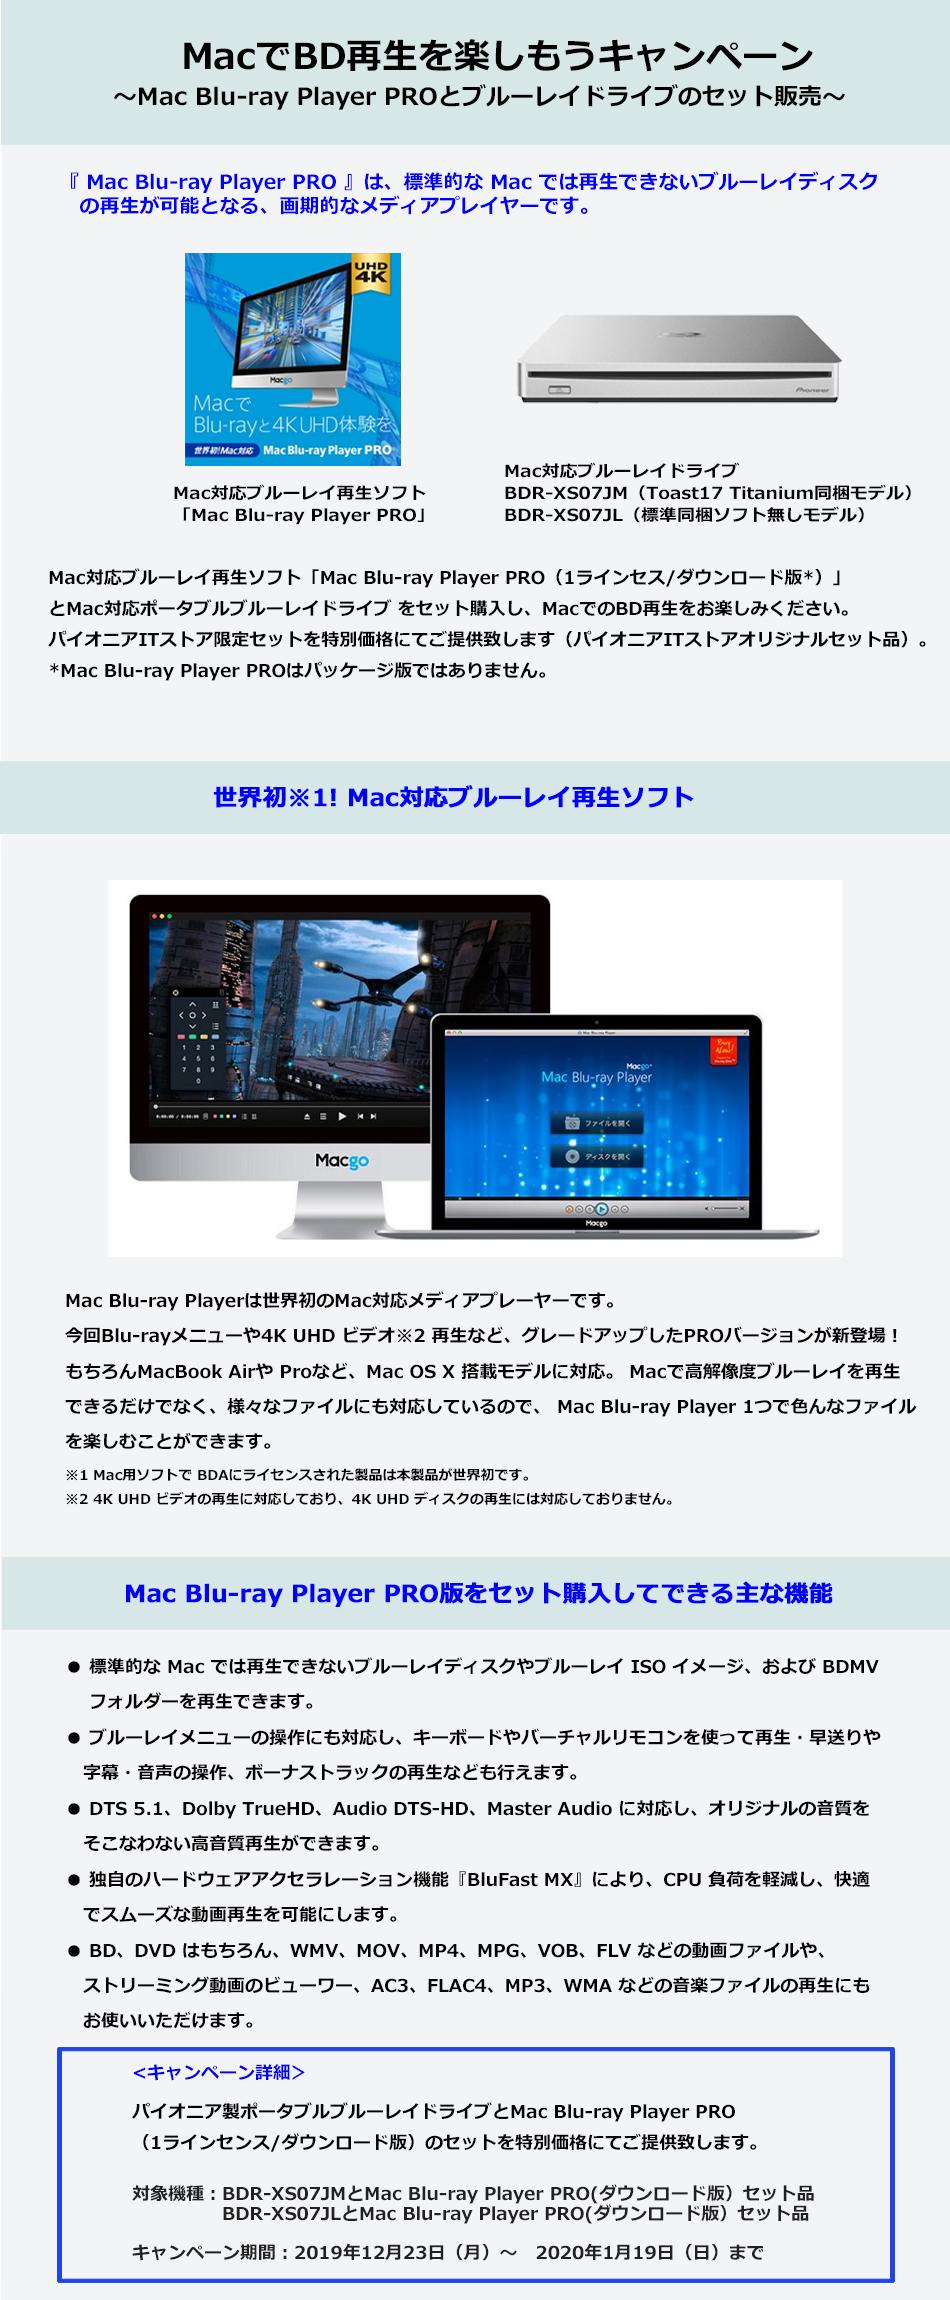 BDR-XS07JM/BDR-XS07JLとMac Blu-ray Player PROセットキャンペーン